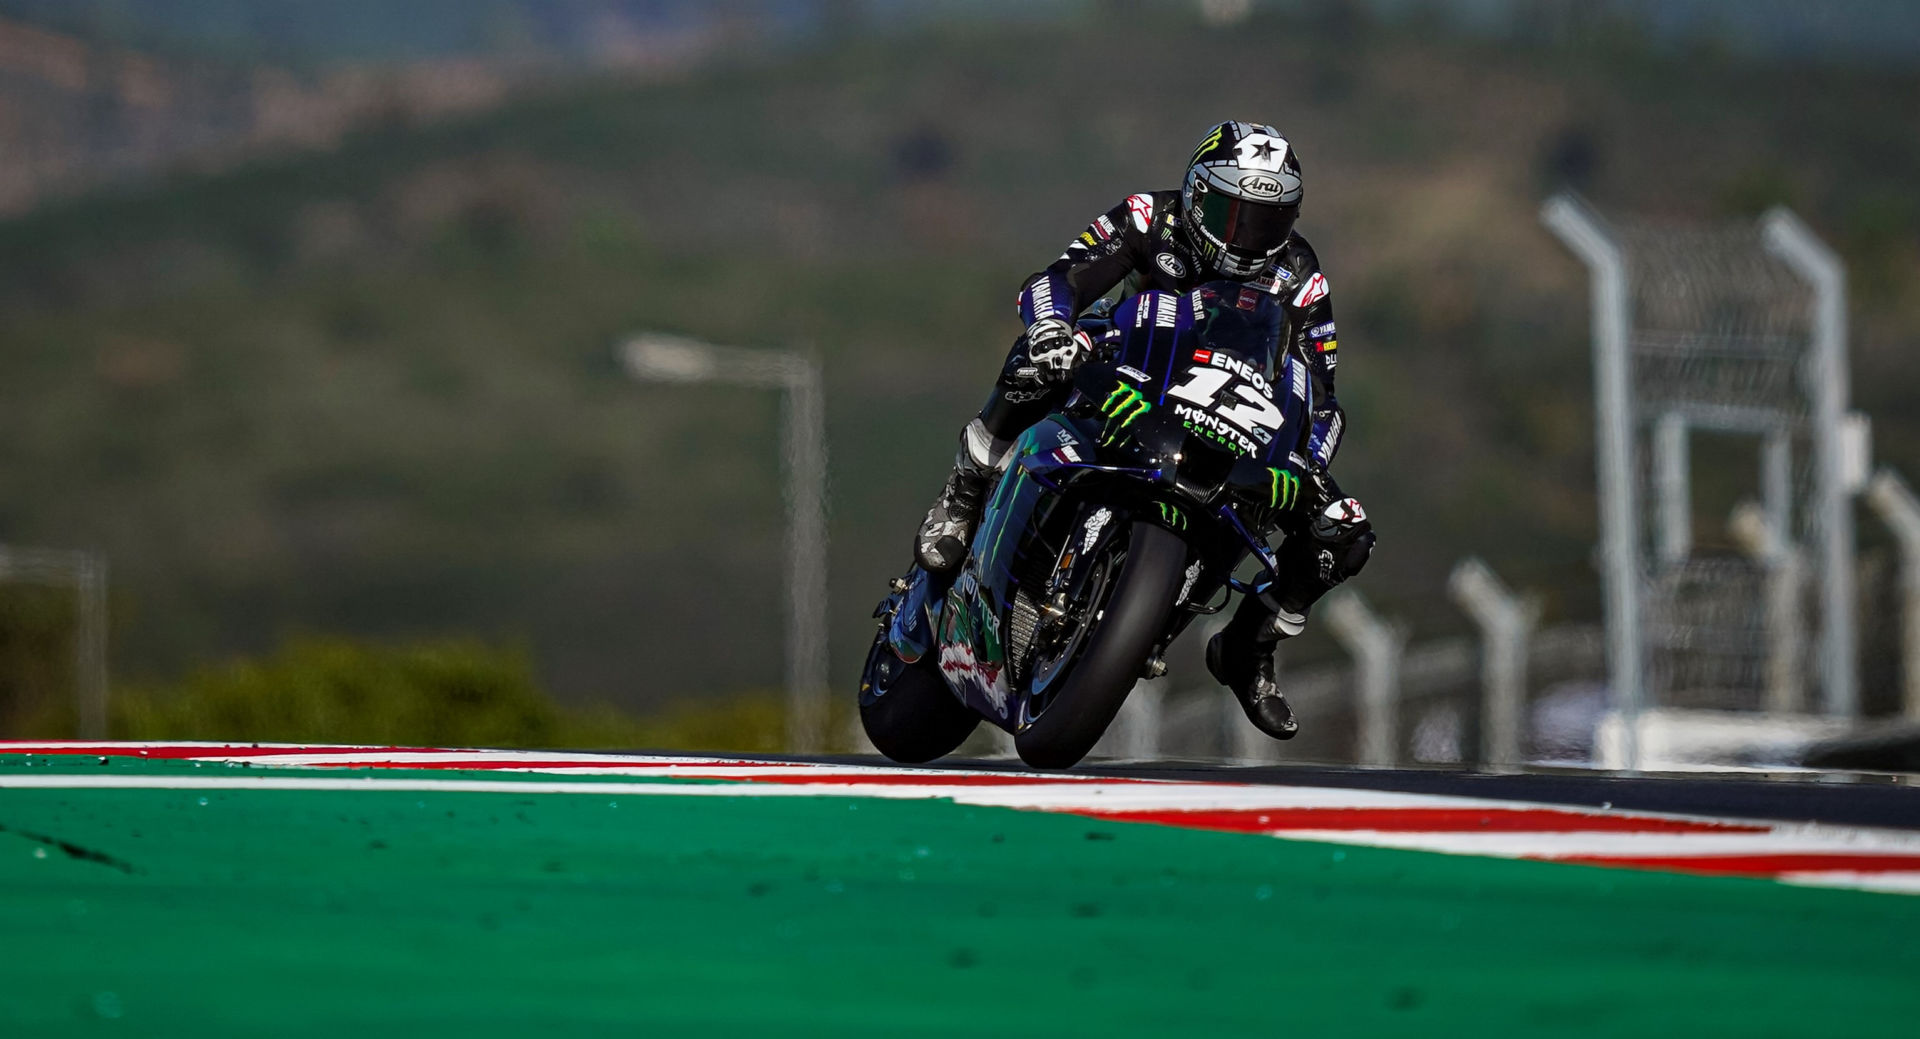 Maverick Vinales (12) during practice at Algarve International Circuit in 2020. Photo courtesy Monster Energy Yamaha.